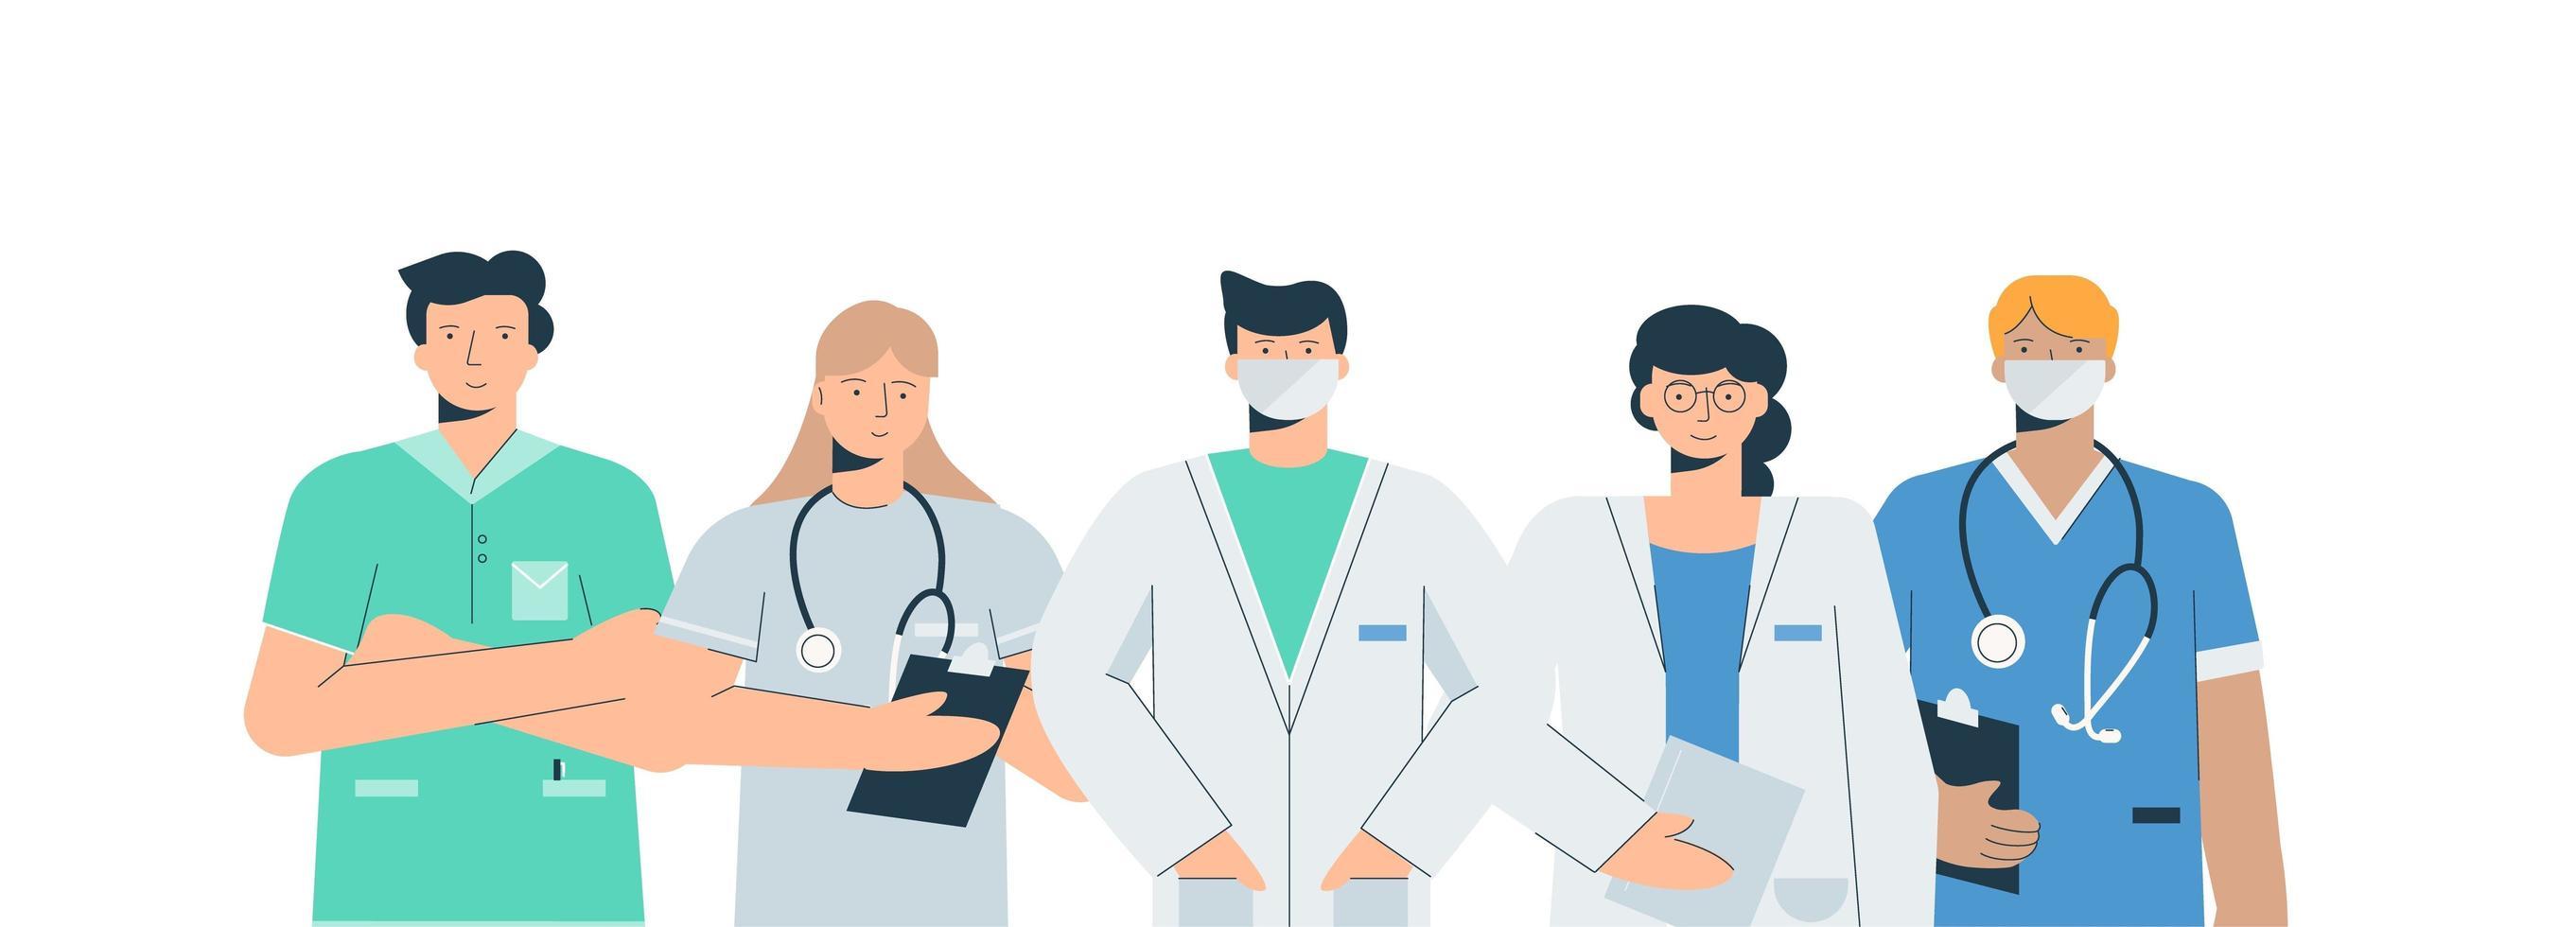 set di dottori in divisa medica vettore